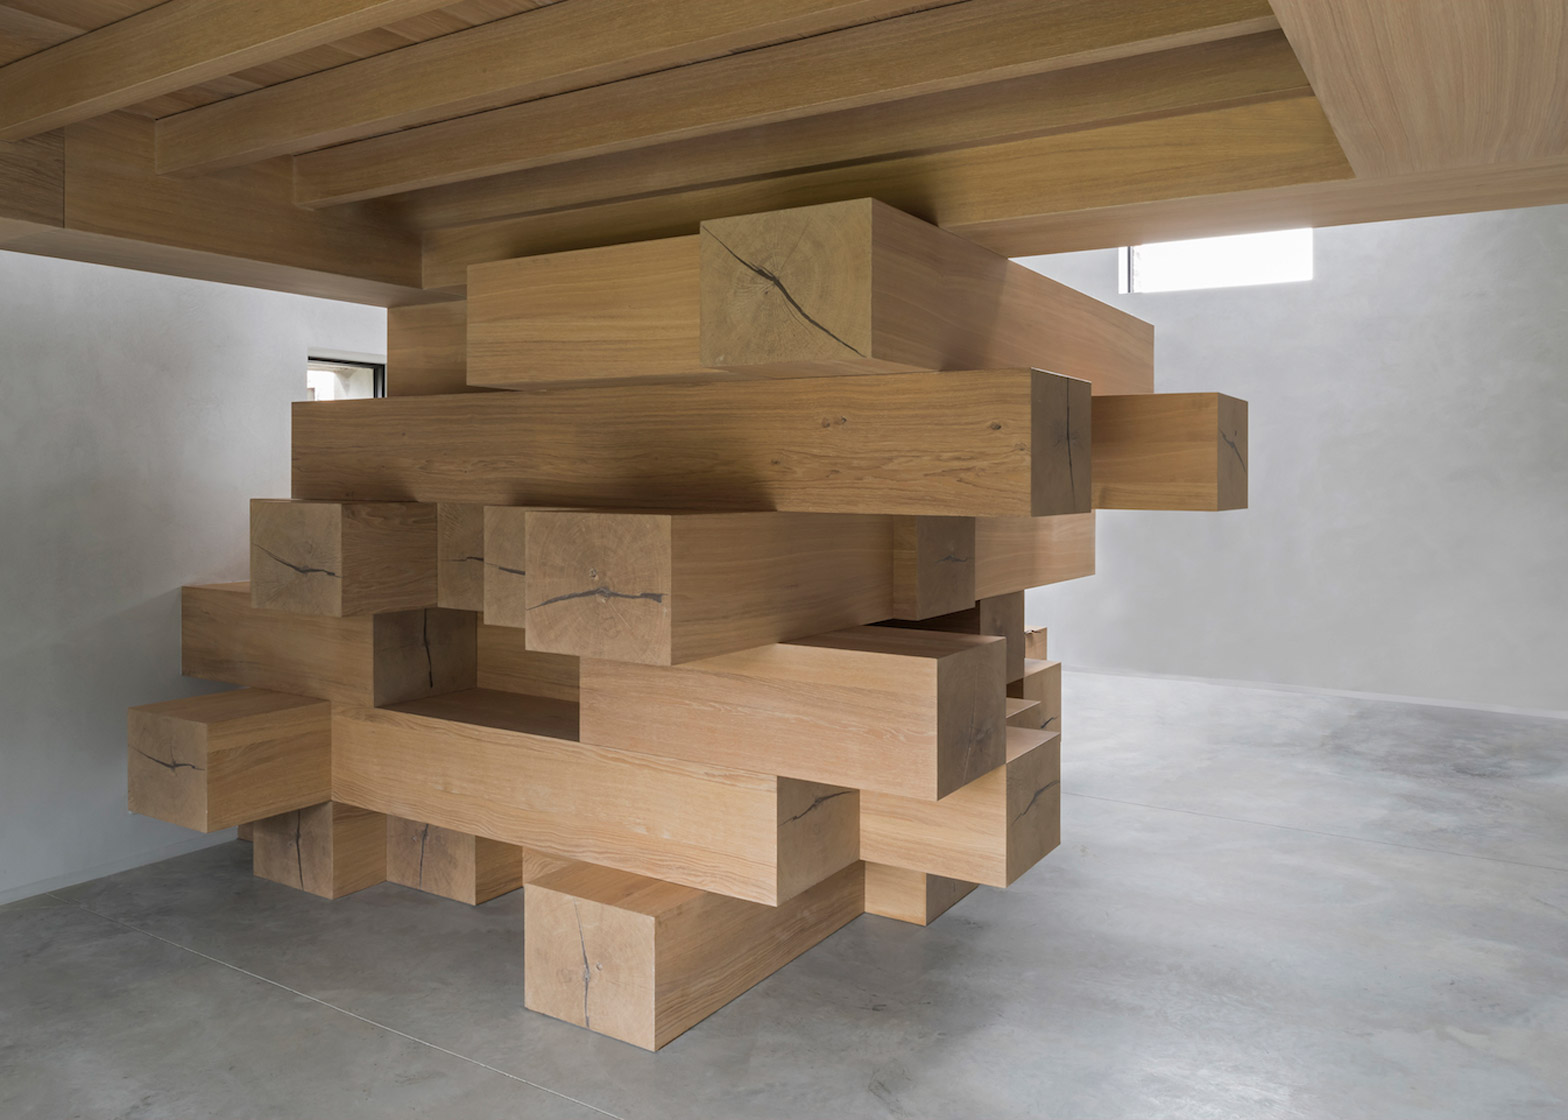 architecture_wood_office_design_studia_interiors_osnovadesign_osnova_poltava_05